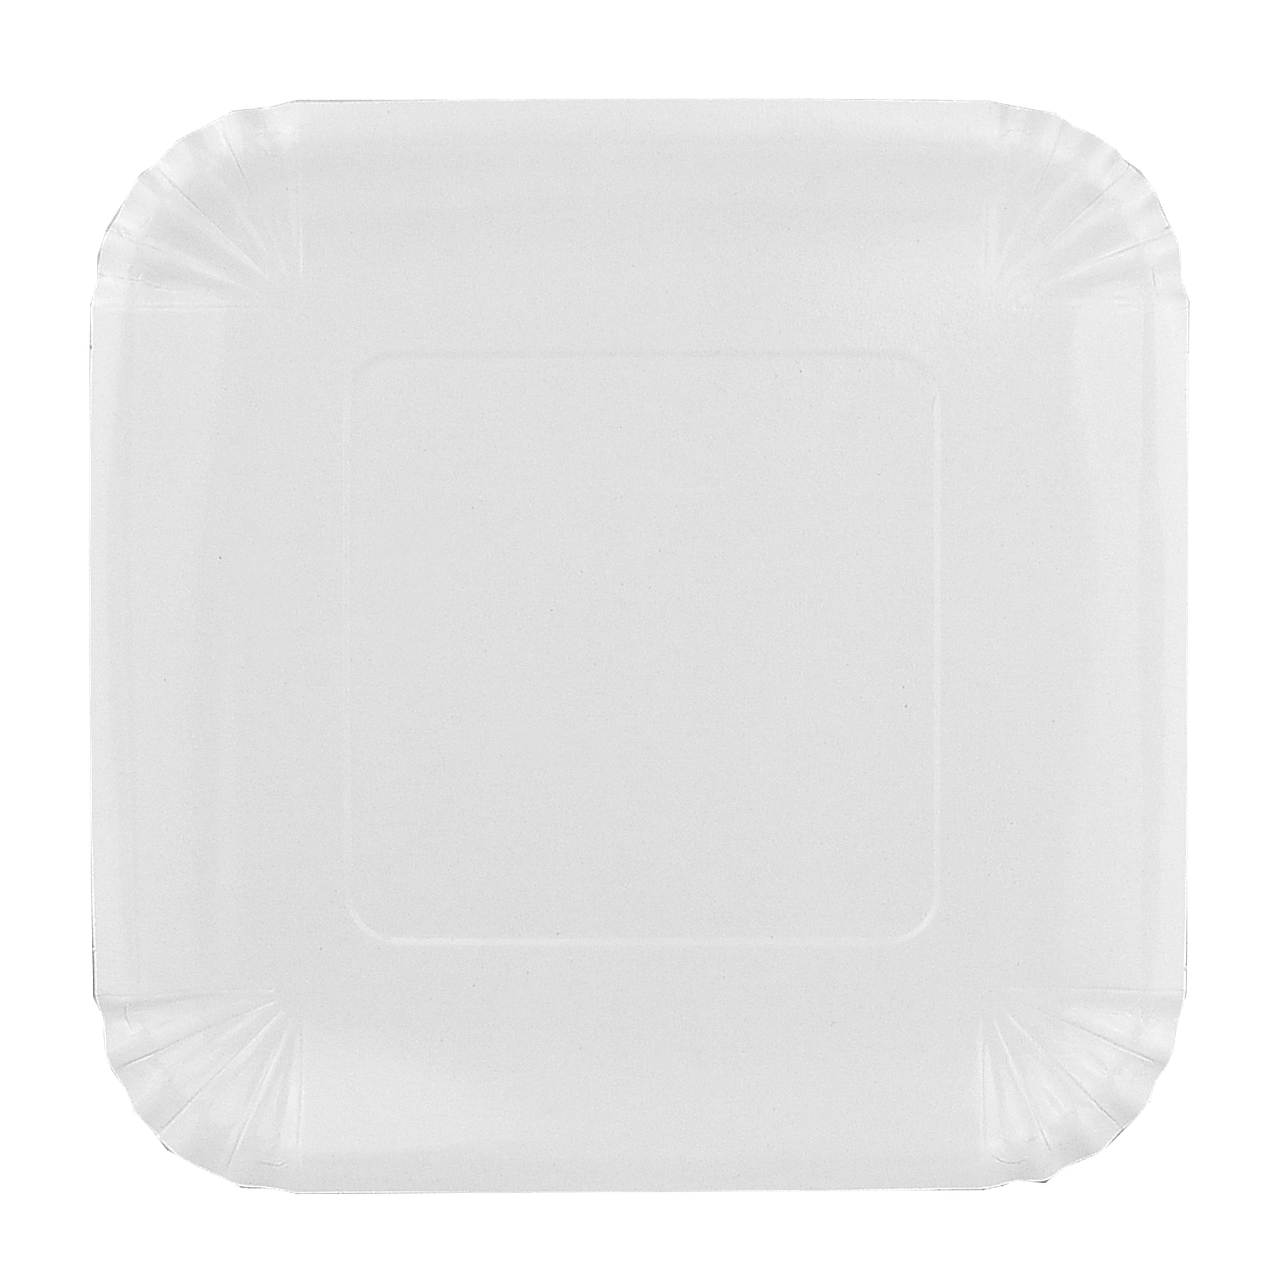 Тарелка картонная Белая ХТ21*21см 100шт/уп